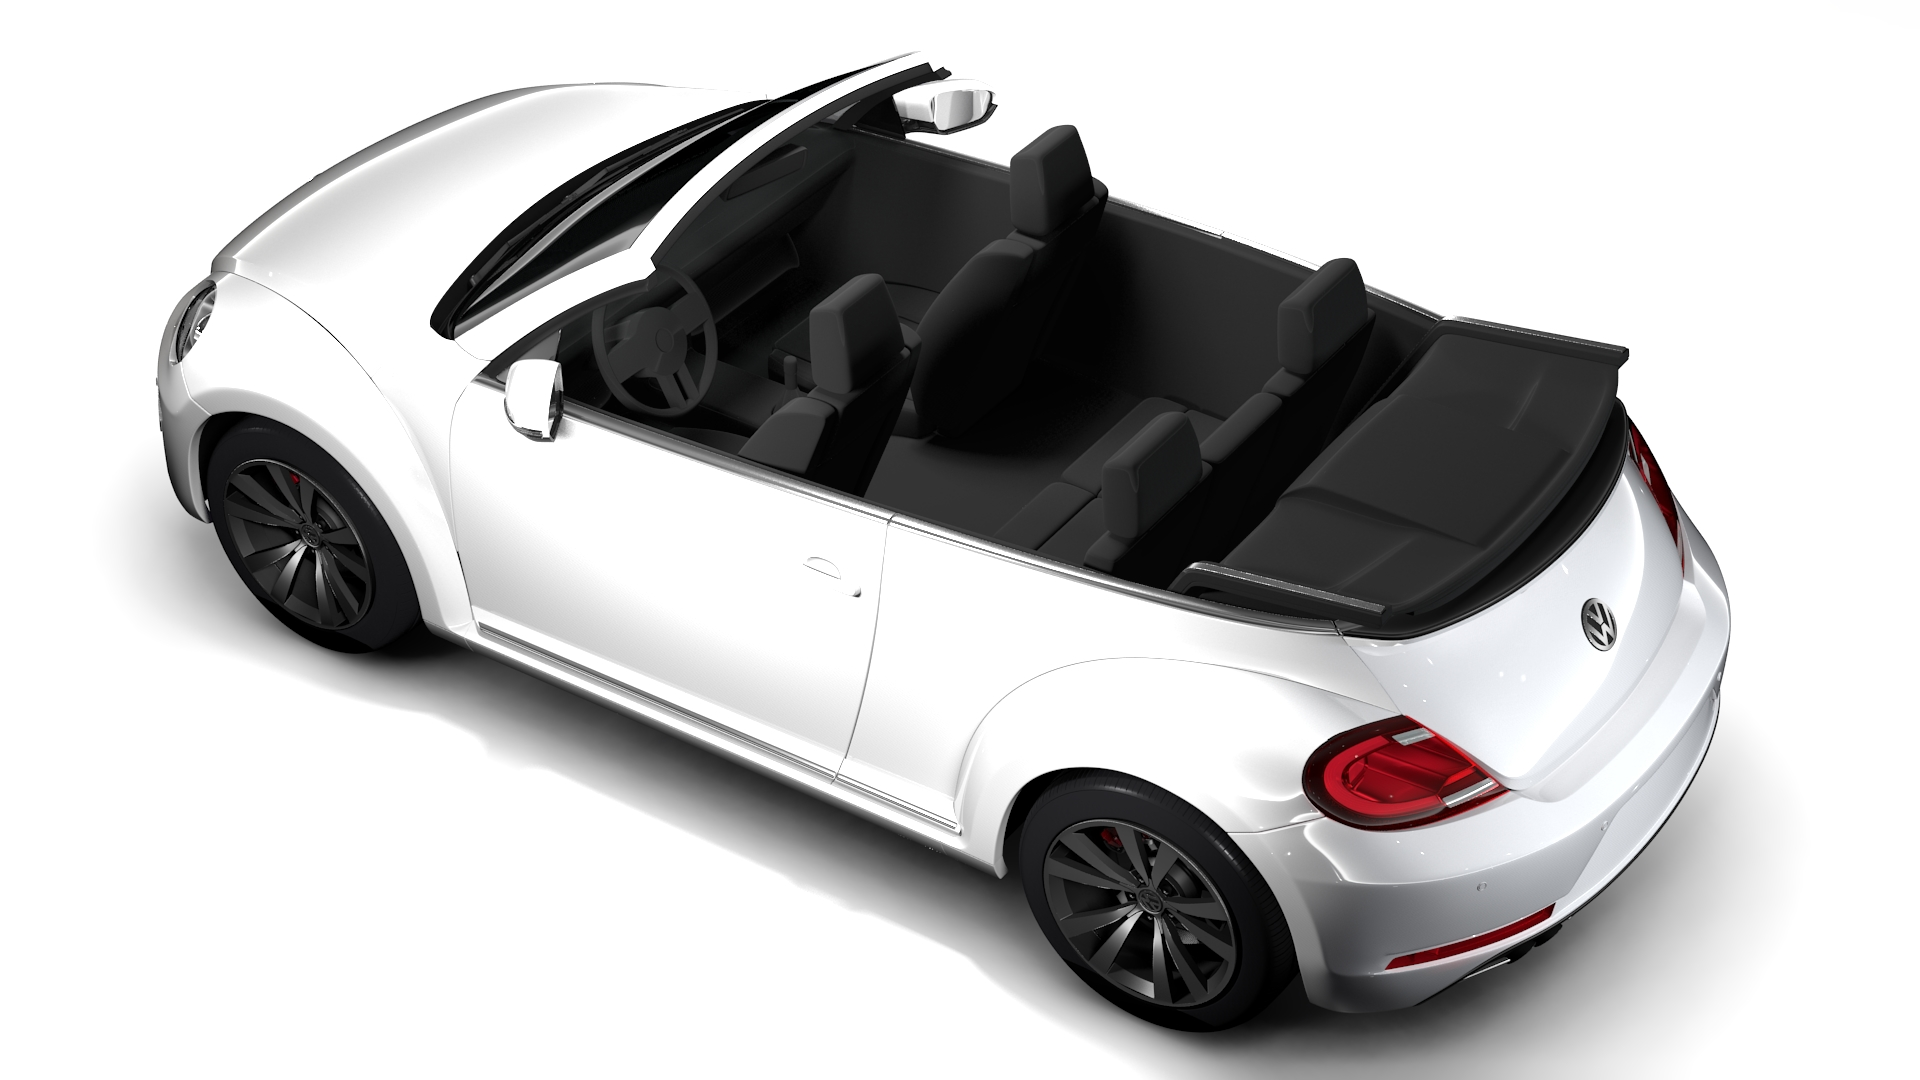 vw beetle cabriolet 2017 3d model 3ds max fbx c4d lwo ma mb hrc xsi obj 221600